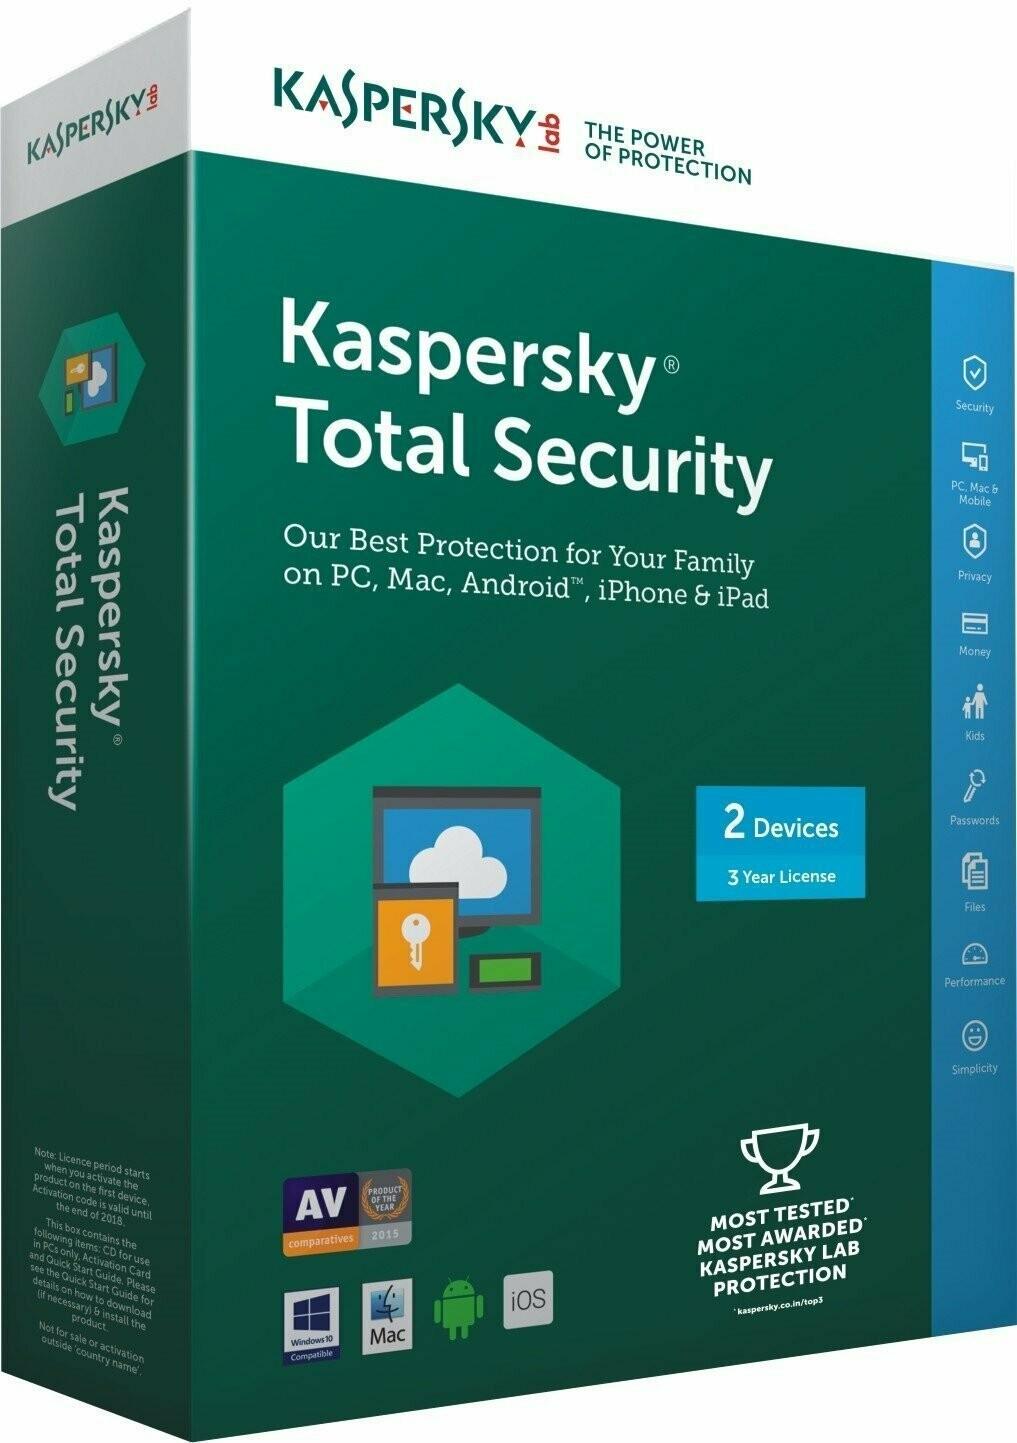 2 User, 3 Year, Kaspersky Total Security